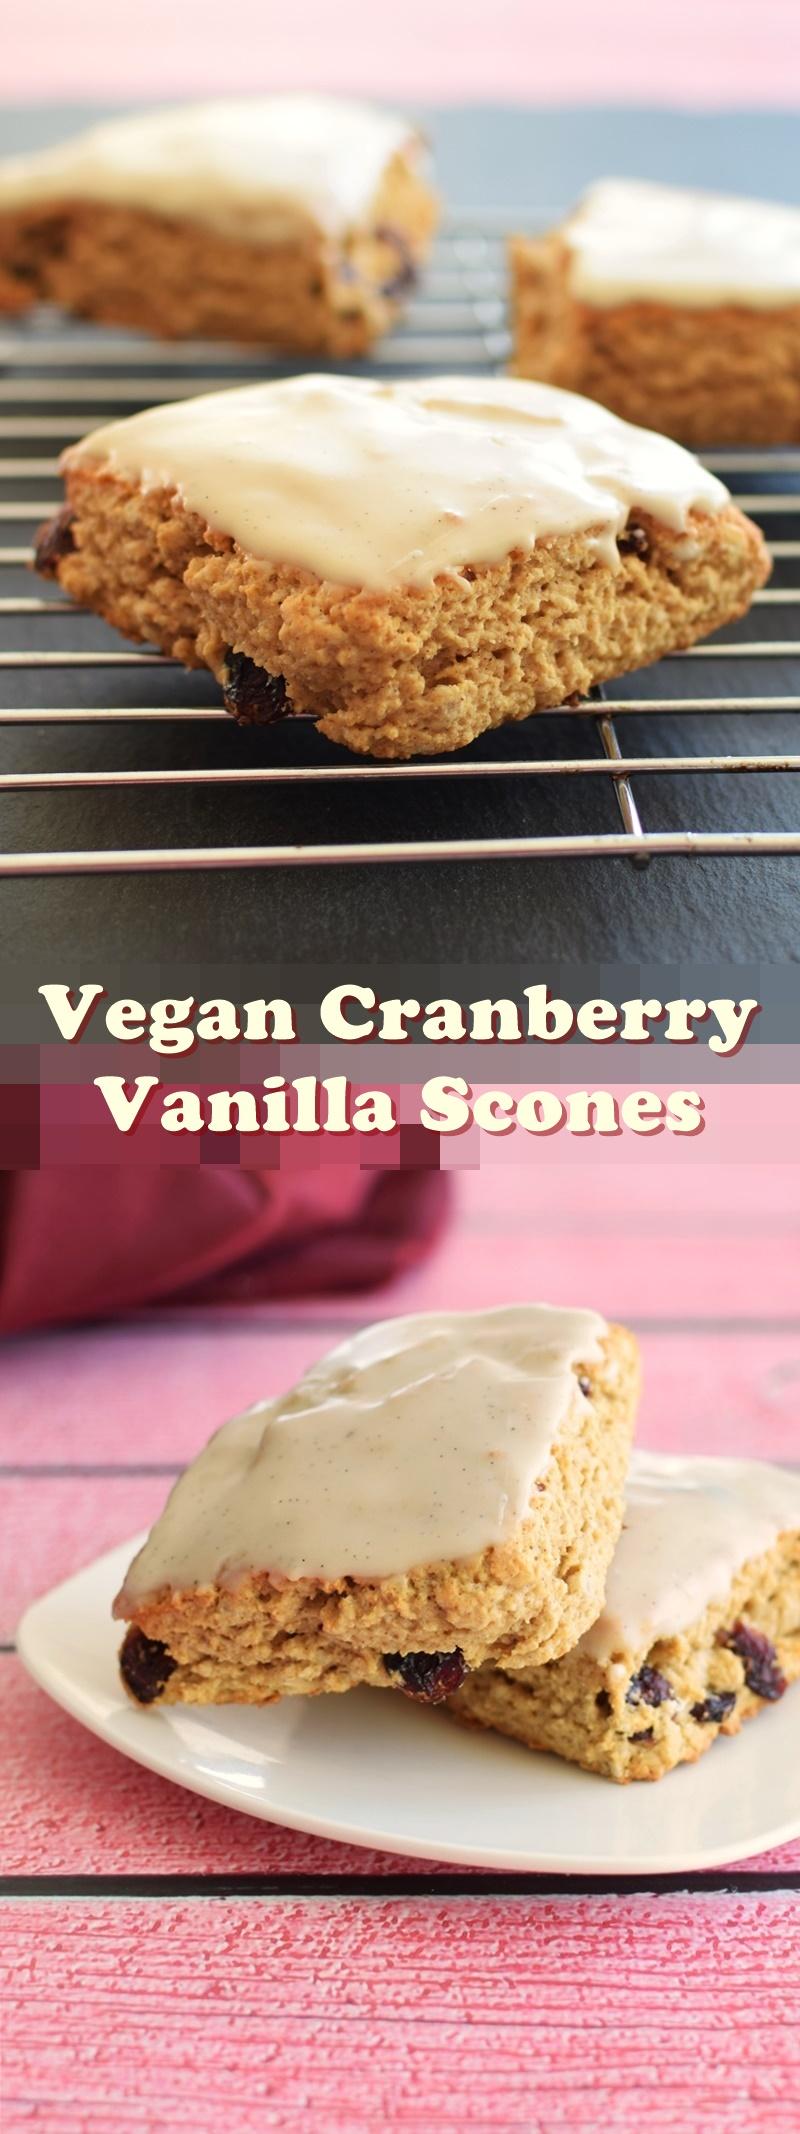 Vegan Cranberry Vanilla Scones